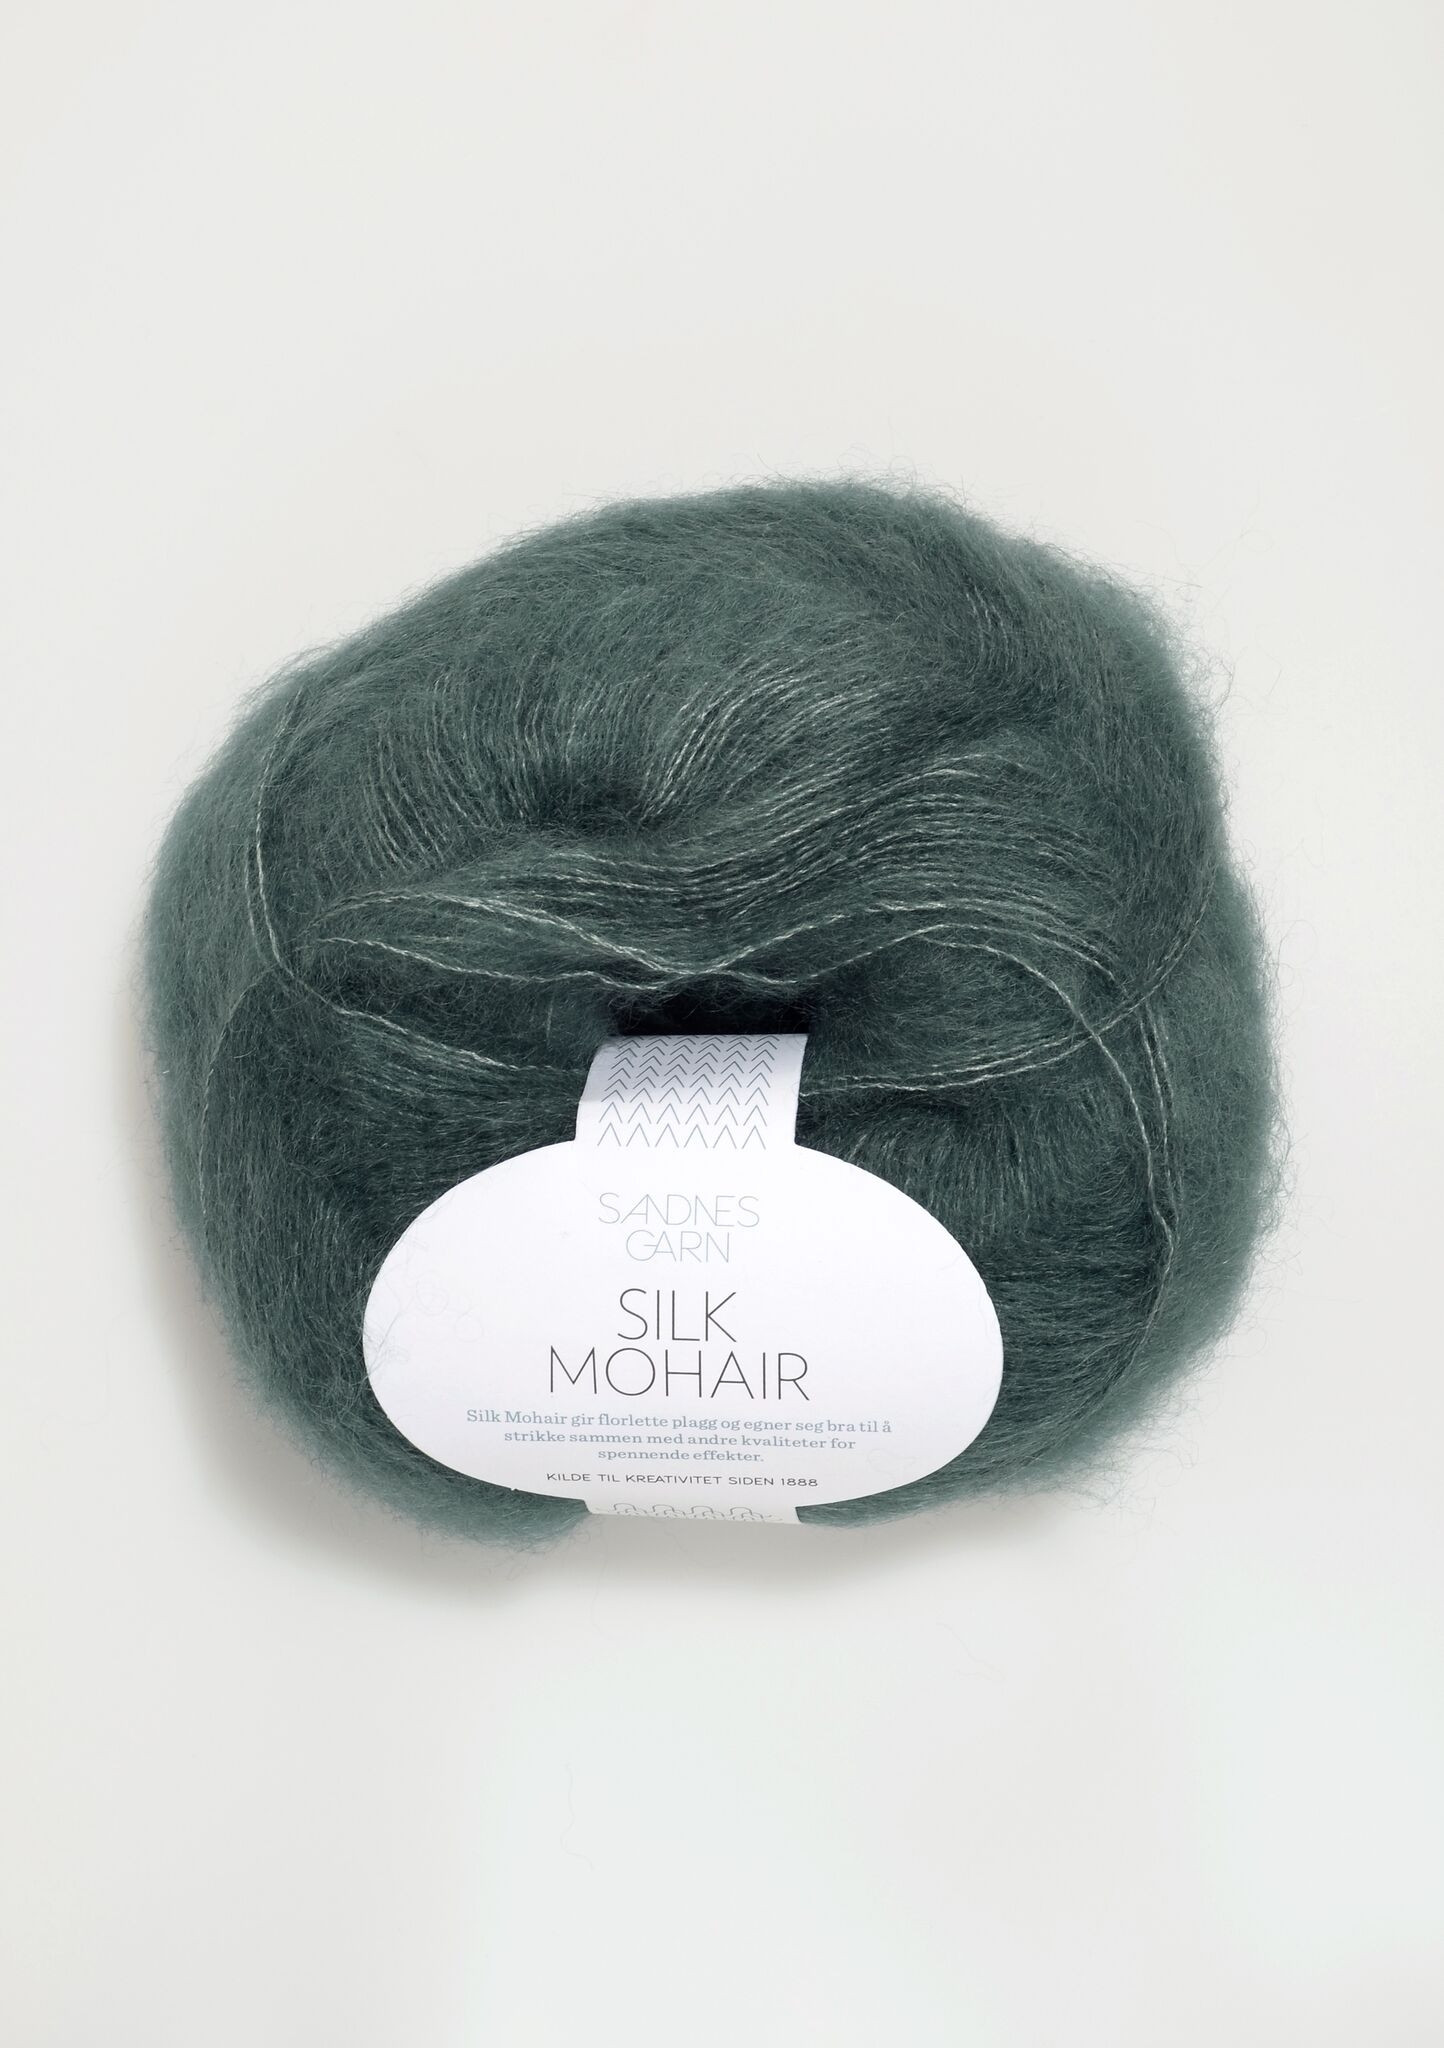 Sandnes Silk Mohair petroleum